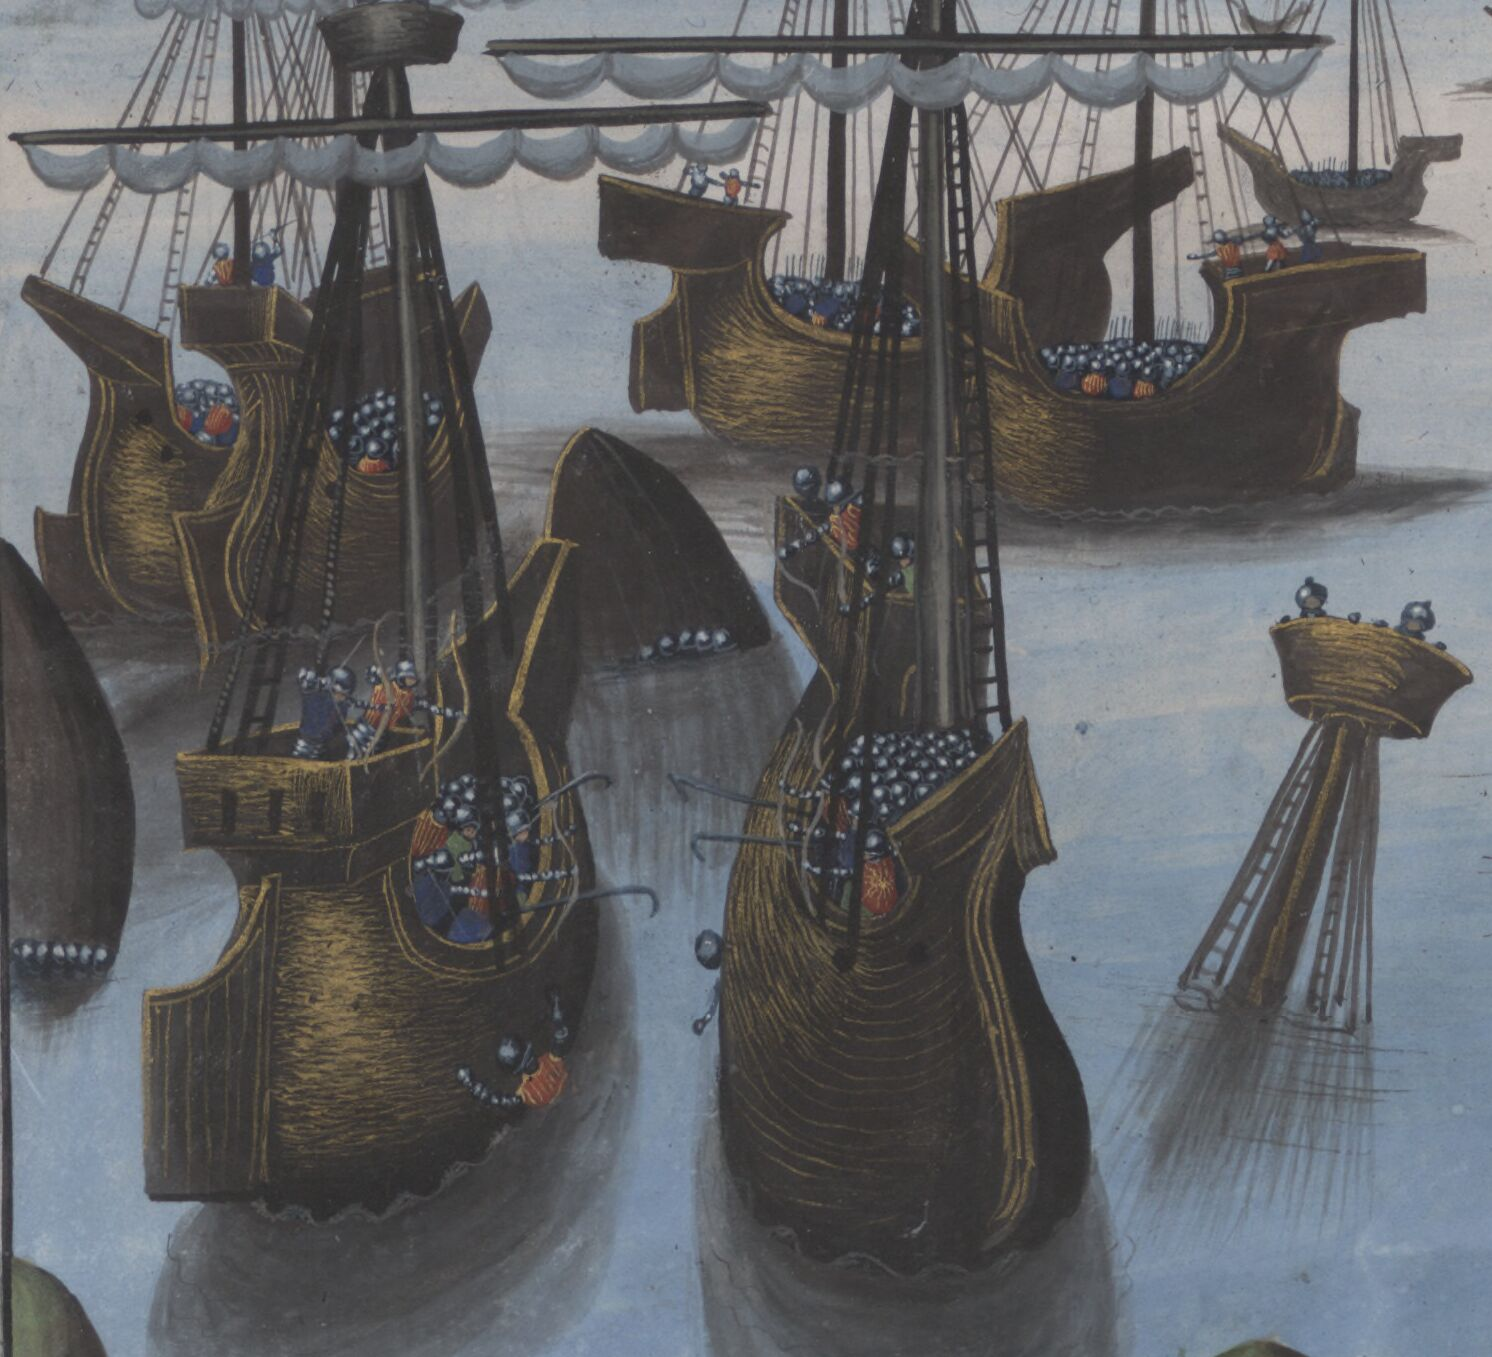 Ship-to-ship warfare